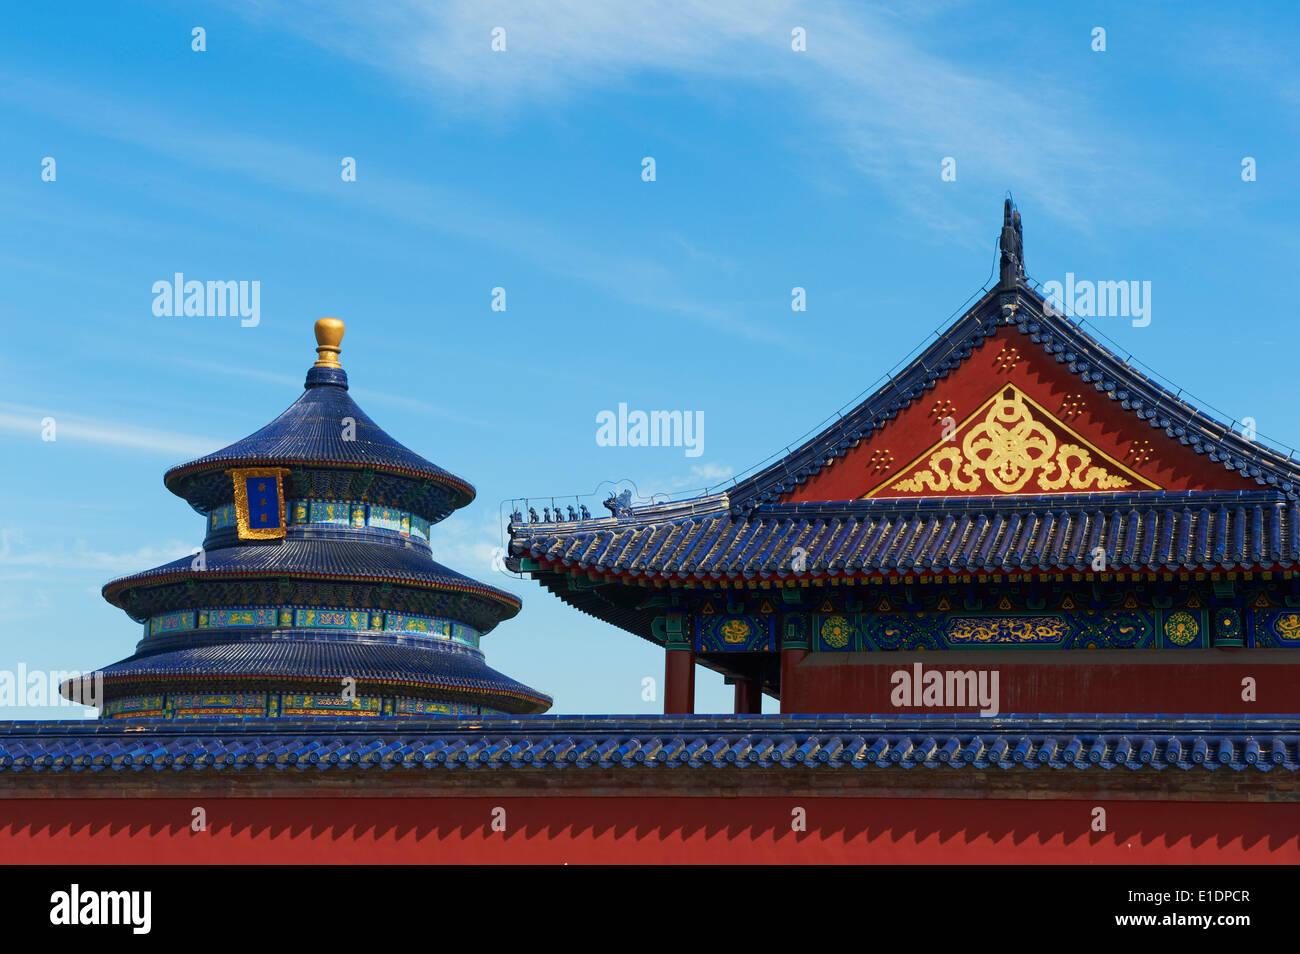 China, Beijing, Temple of Heaven, Unesco world heritage - Stock Image